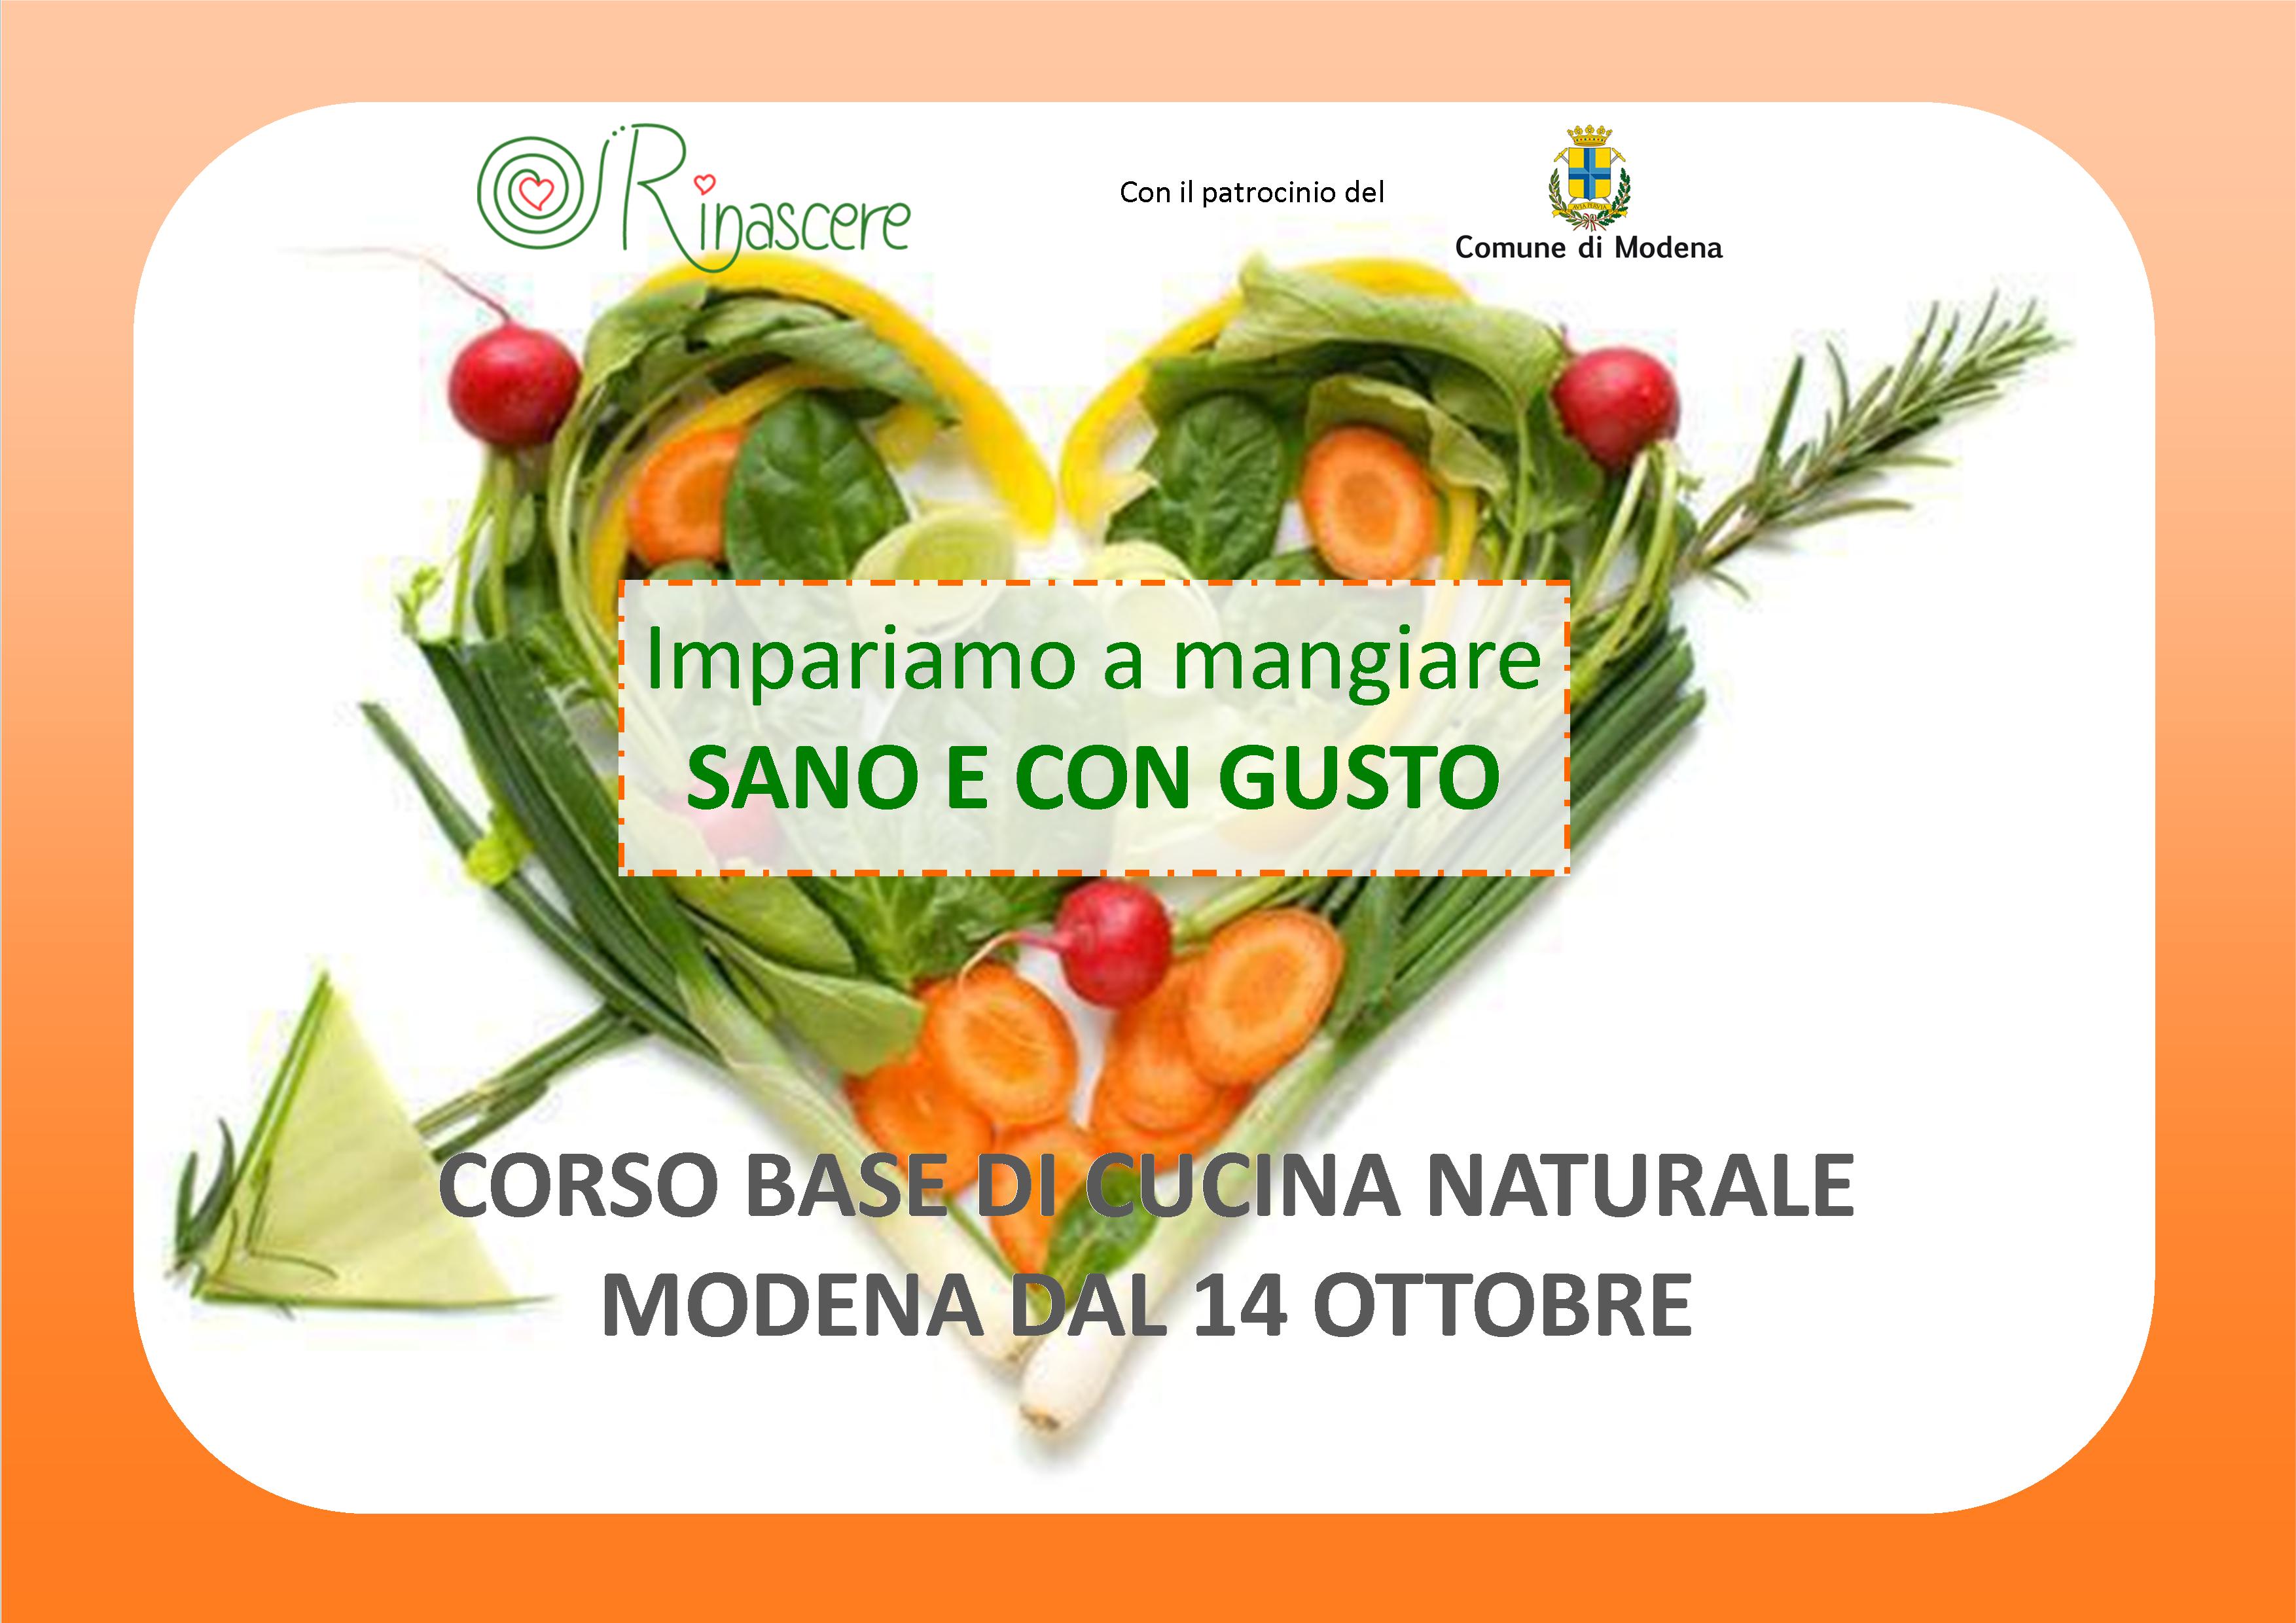 www.desmodena.it - corso base cucina naturale a modena - Corsi Cucina Modena